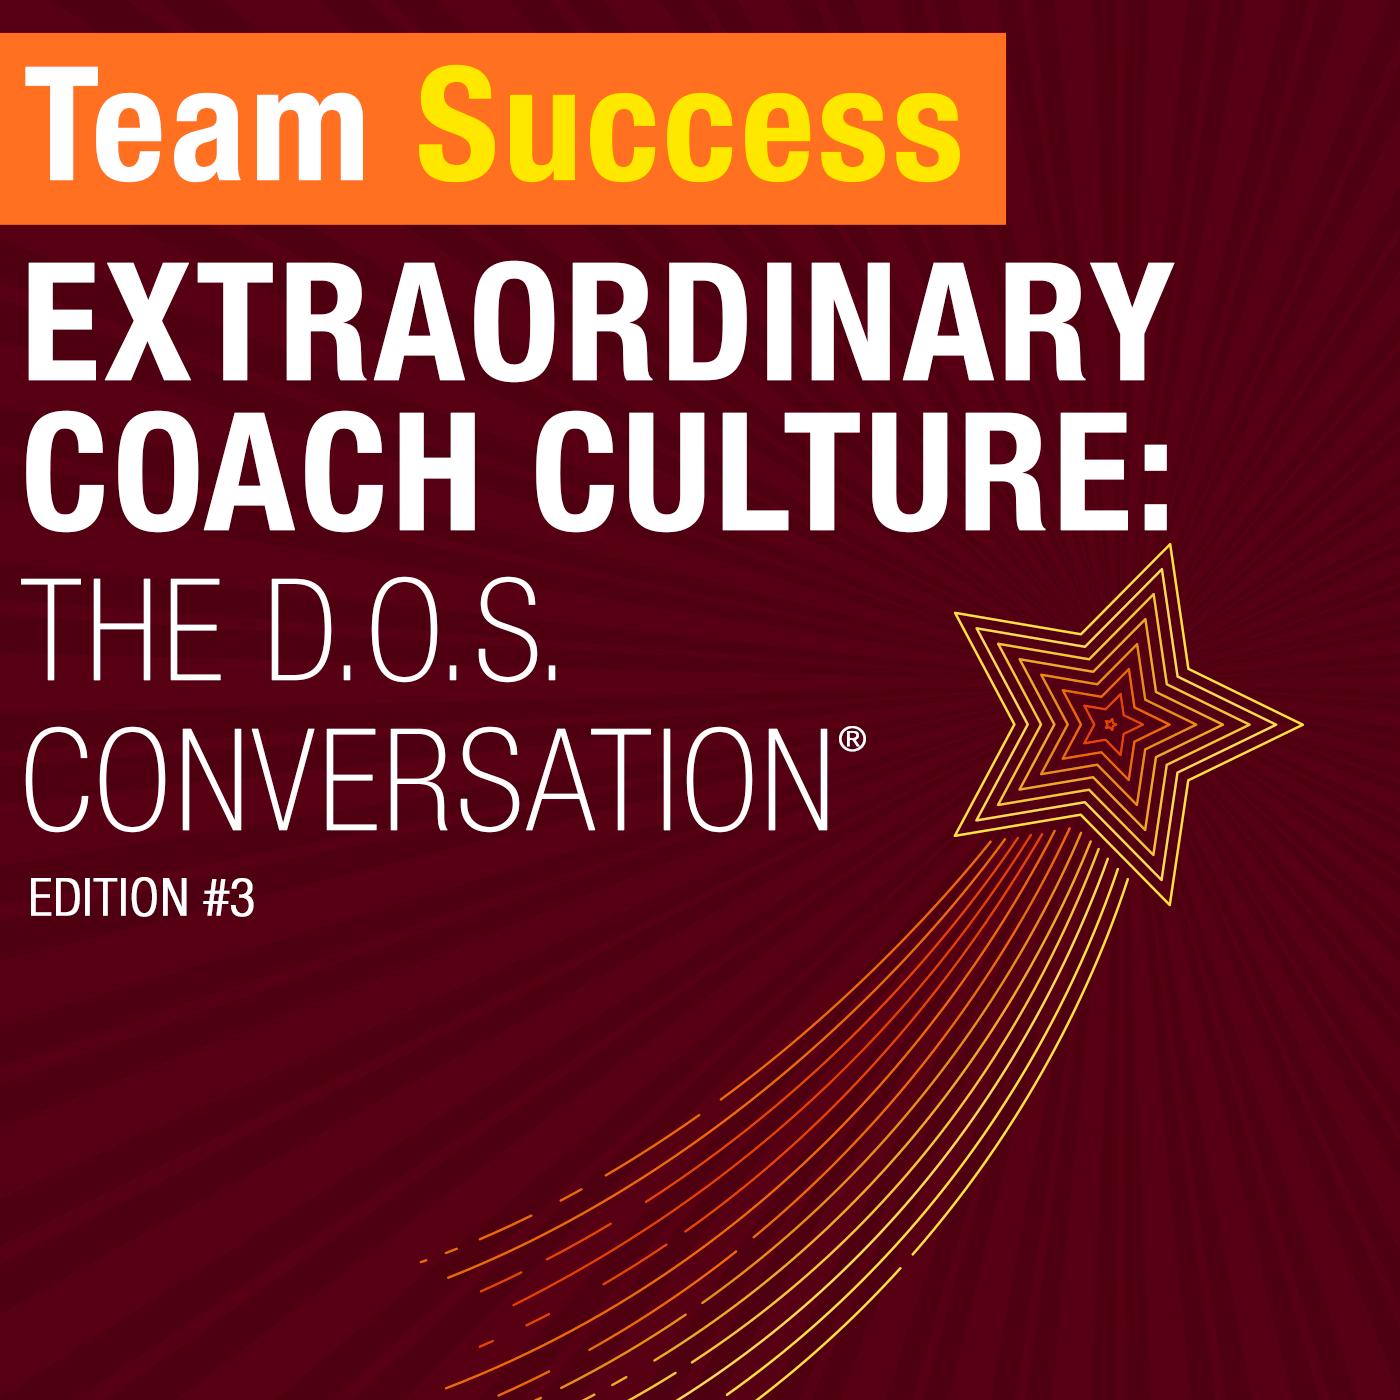 Extraordinary Coach Culture: The D.O.S. Conversation